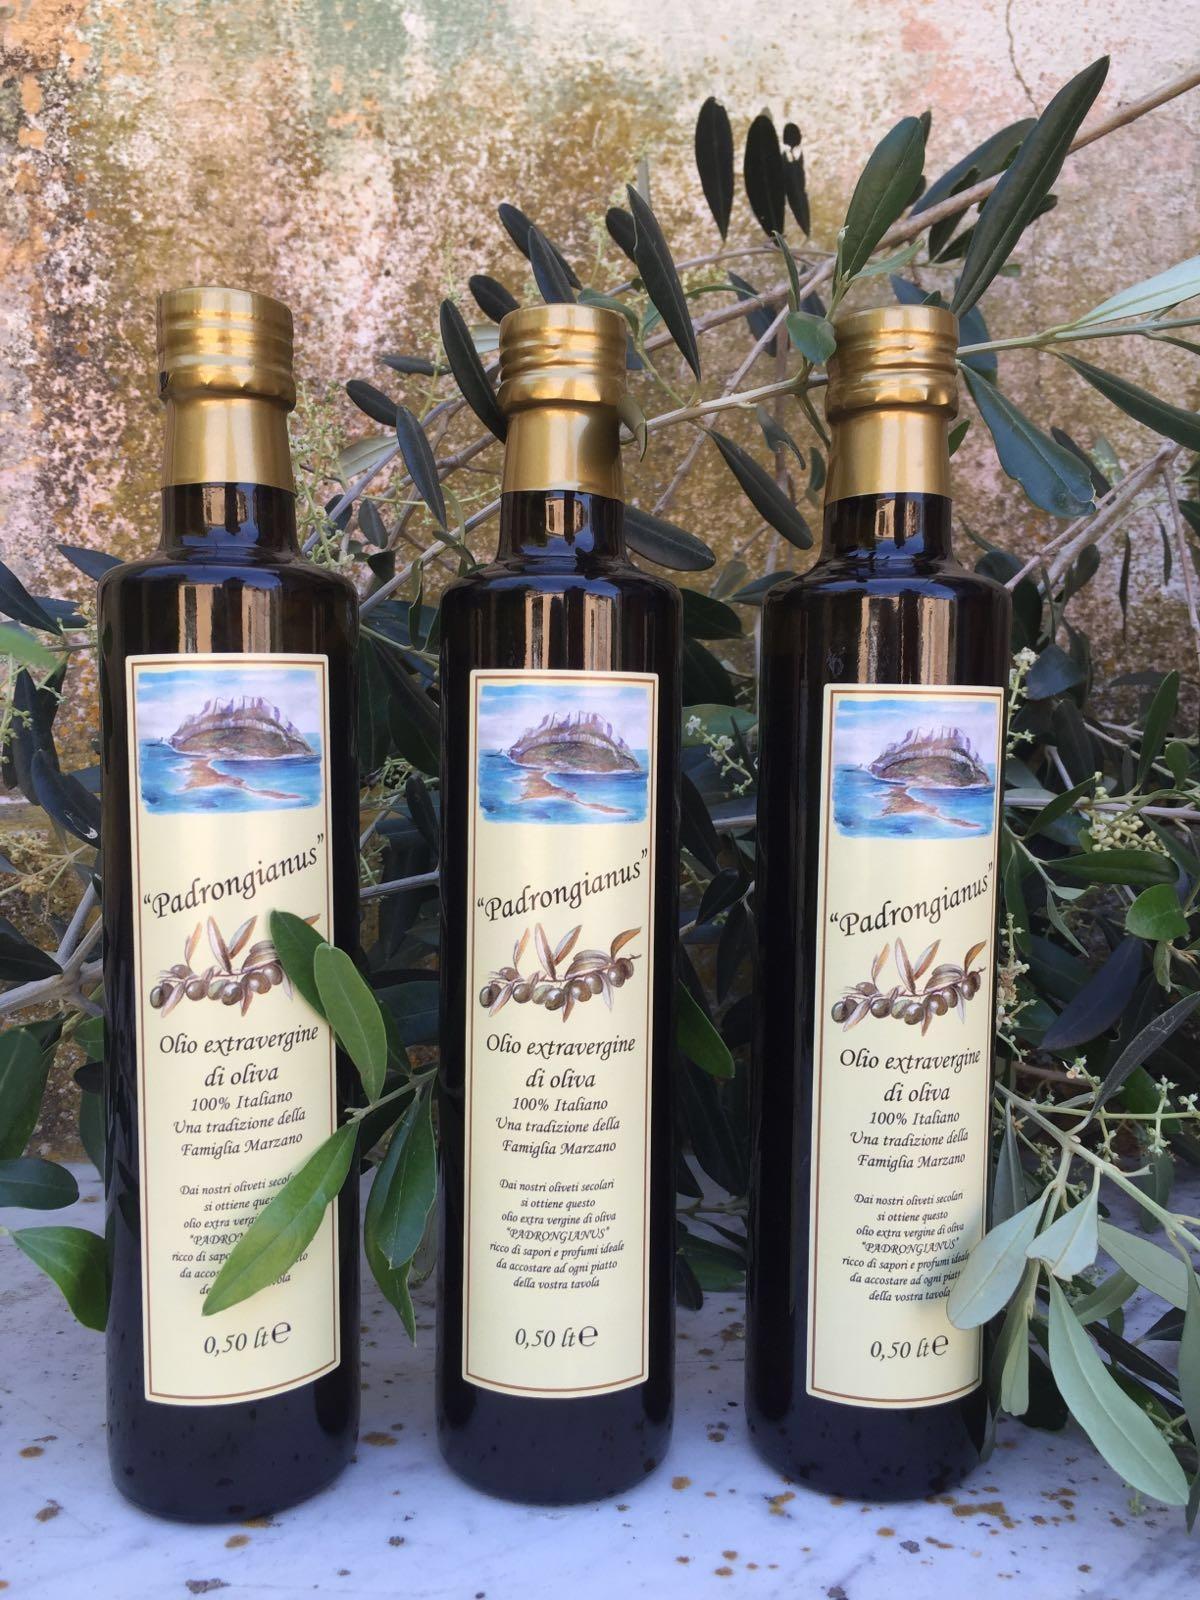 Si chiama Padrongianus e ha l'impronta sarda delle olive Bosana e Semidana